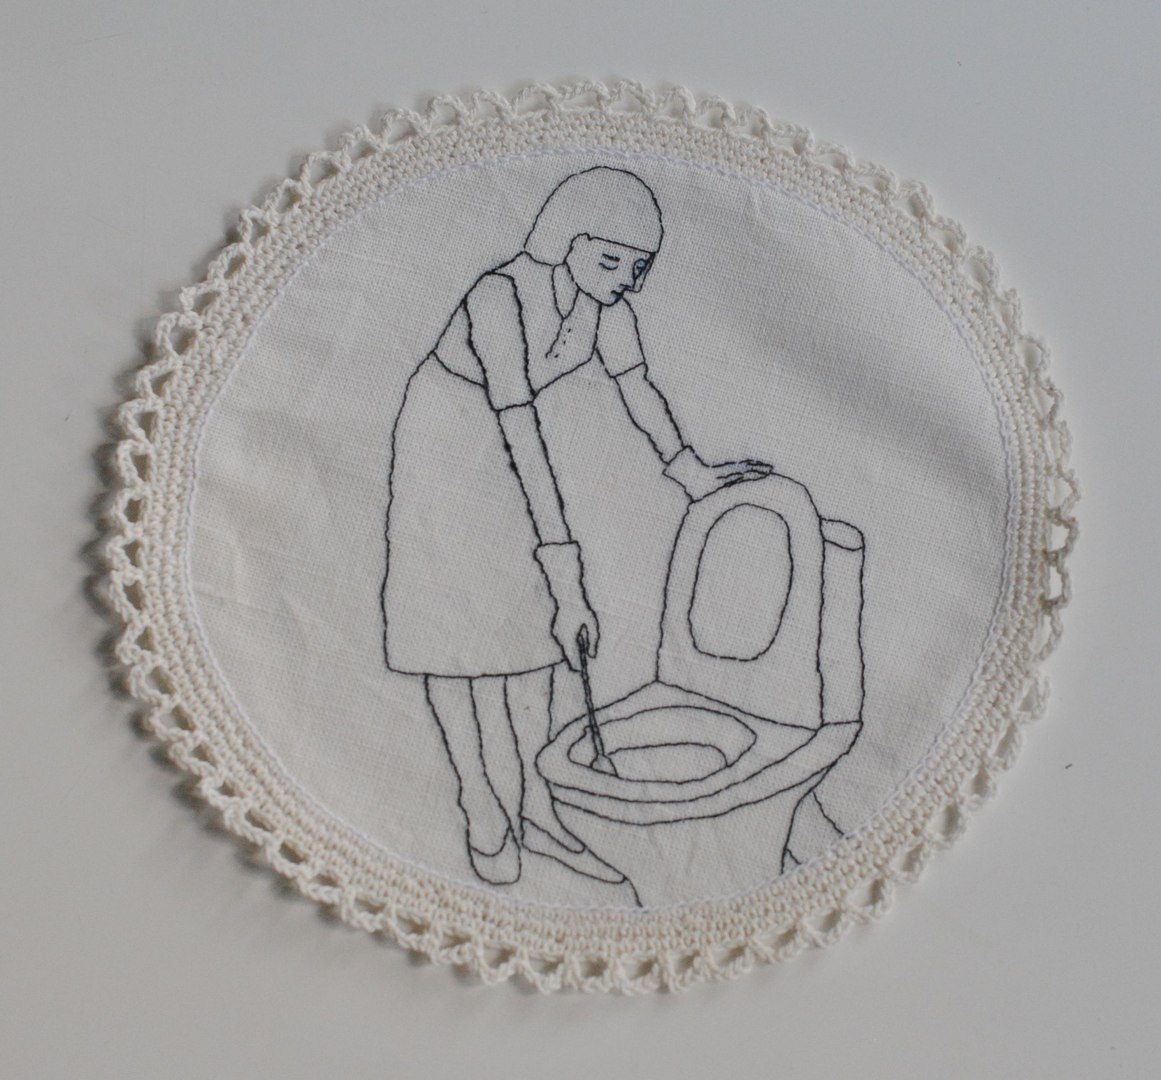 Омские феминистки вышили салфетки про женское предназначение